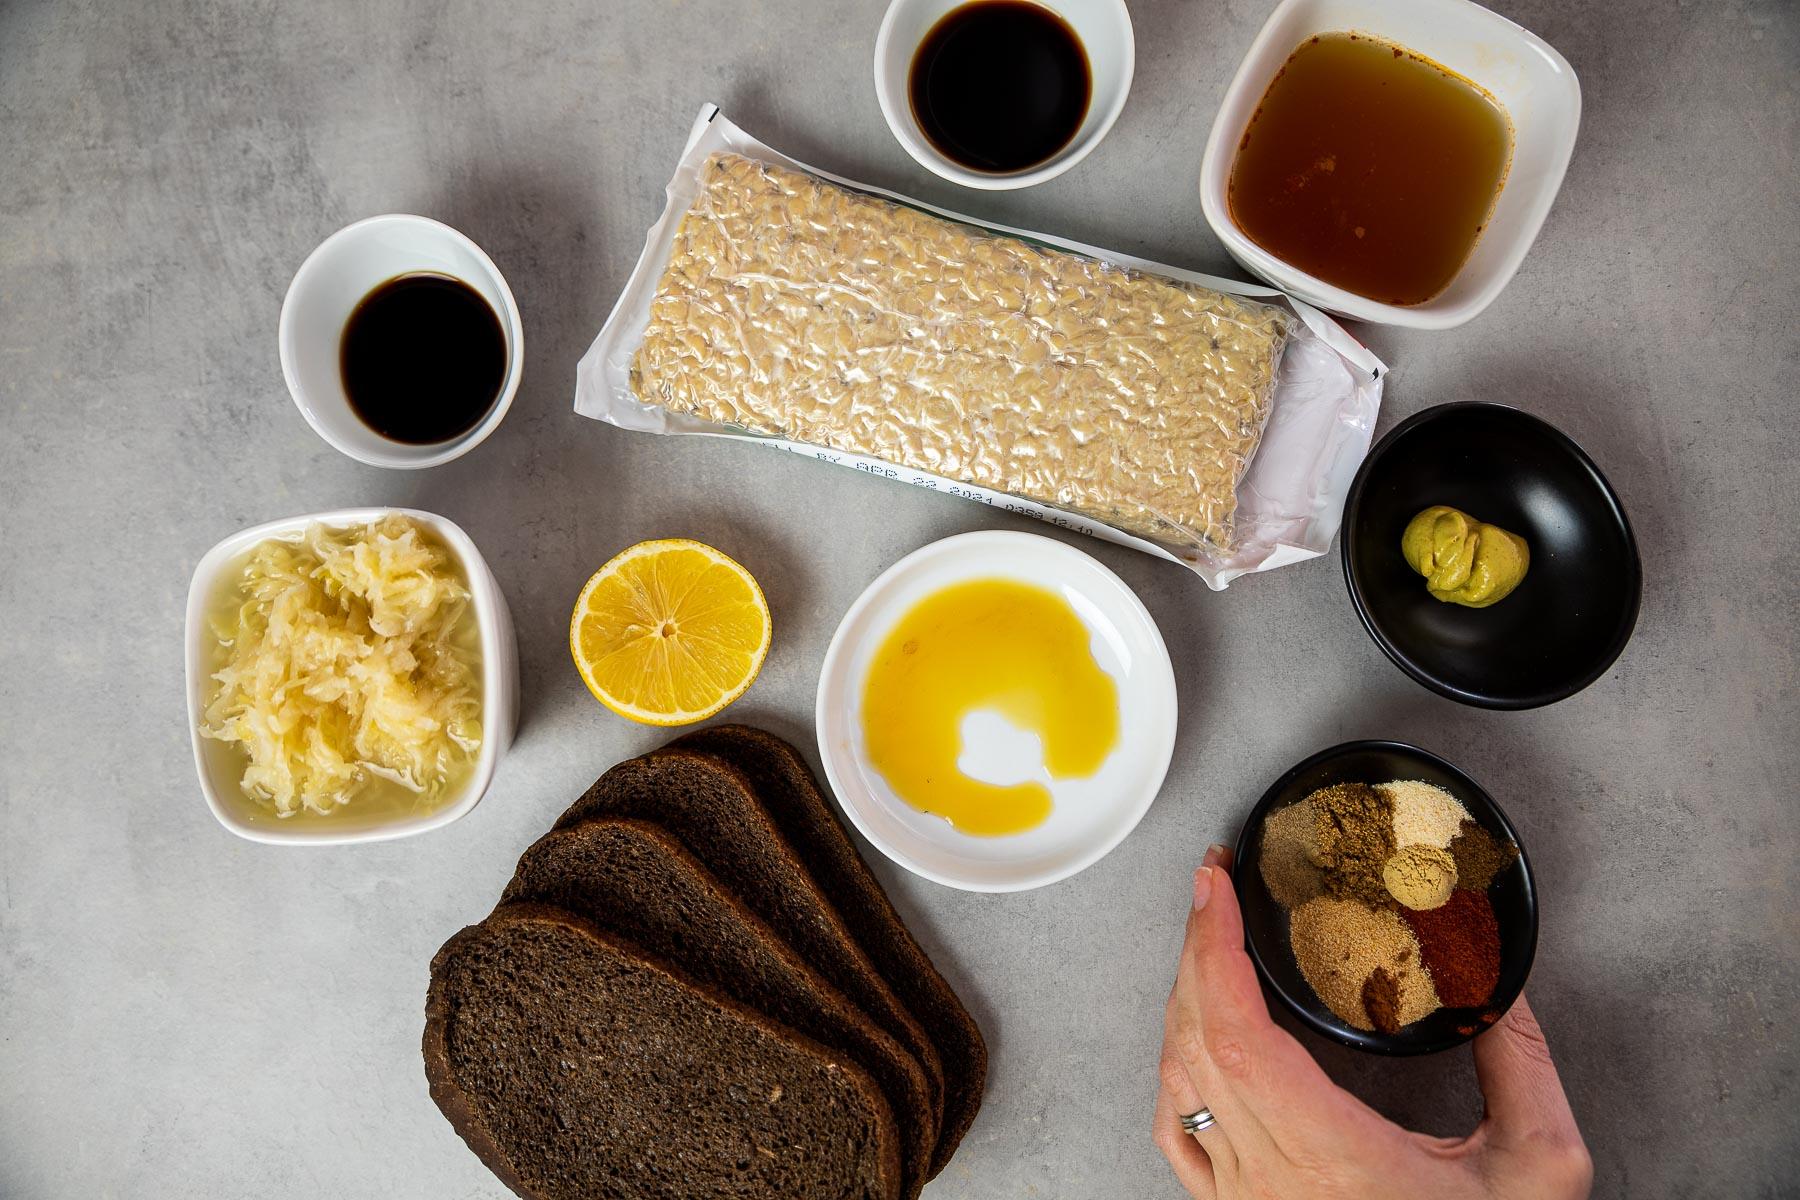 Ingredients for the Reuben sandwich